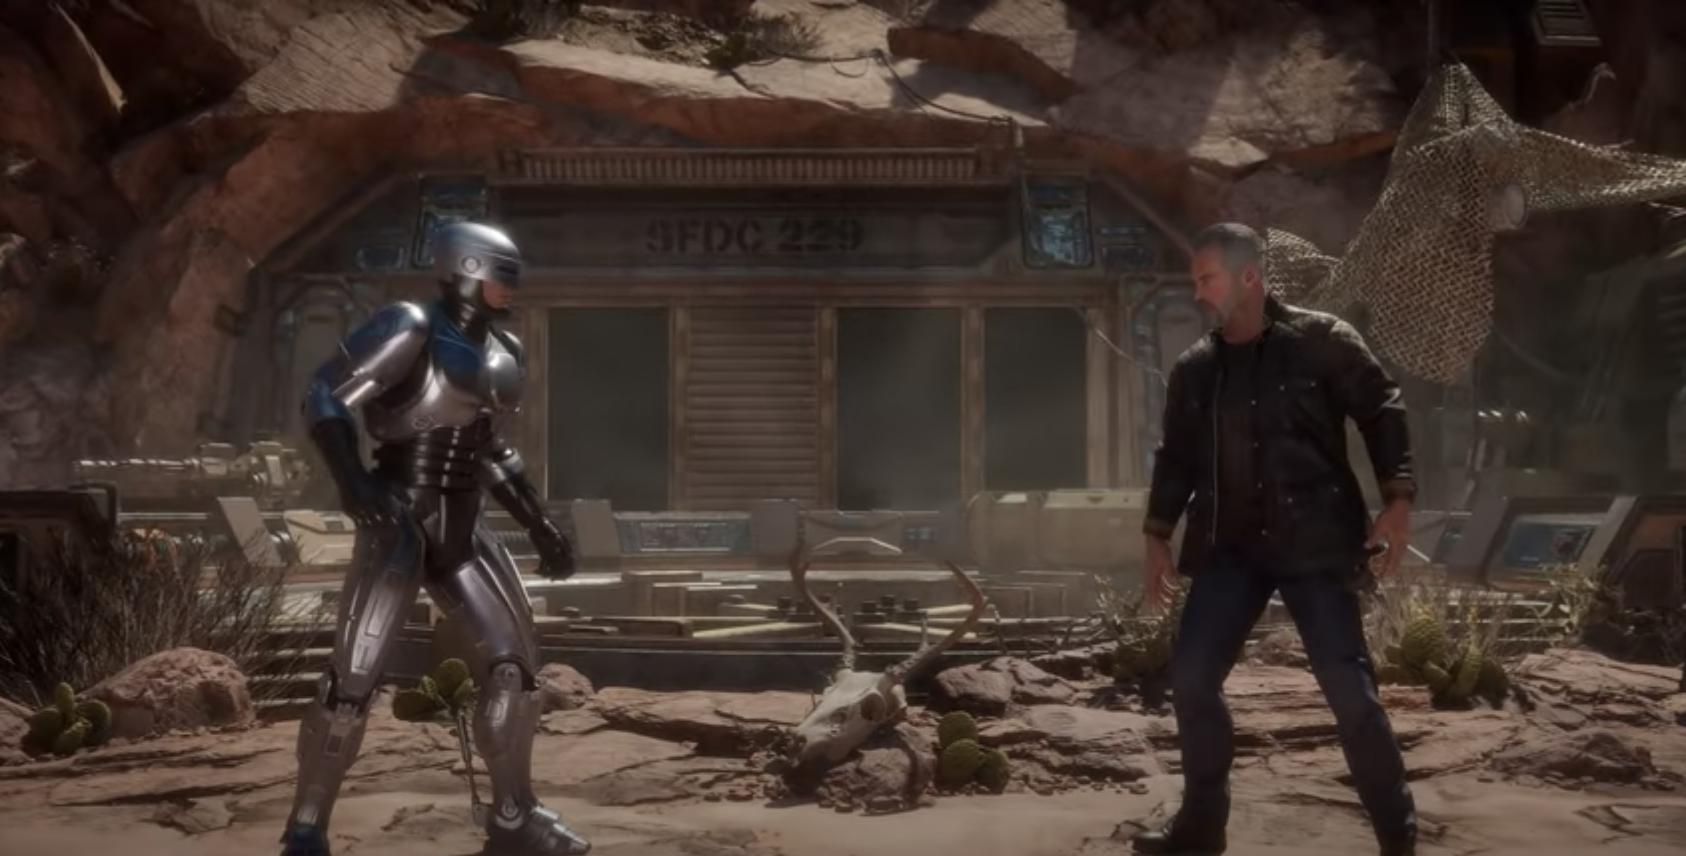 RoboCop & Terminator Issue Cybernetic Fades In 2 Mortal Kombat 11 Trailers